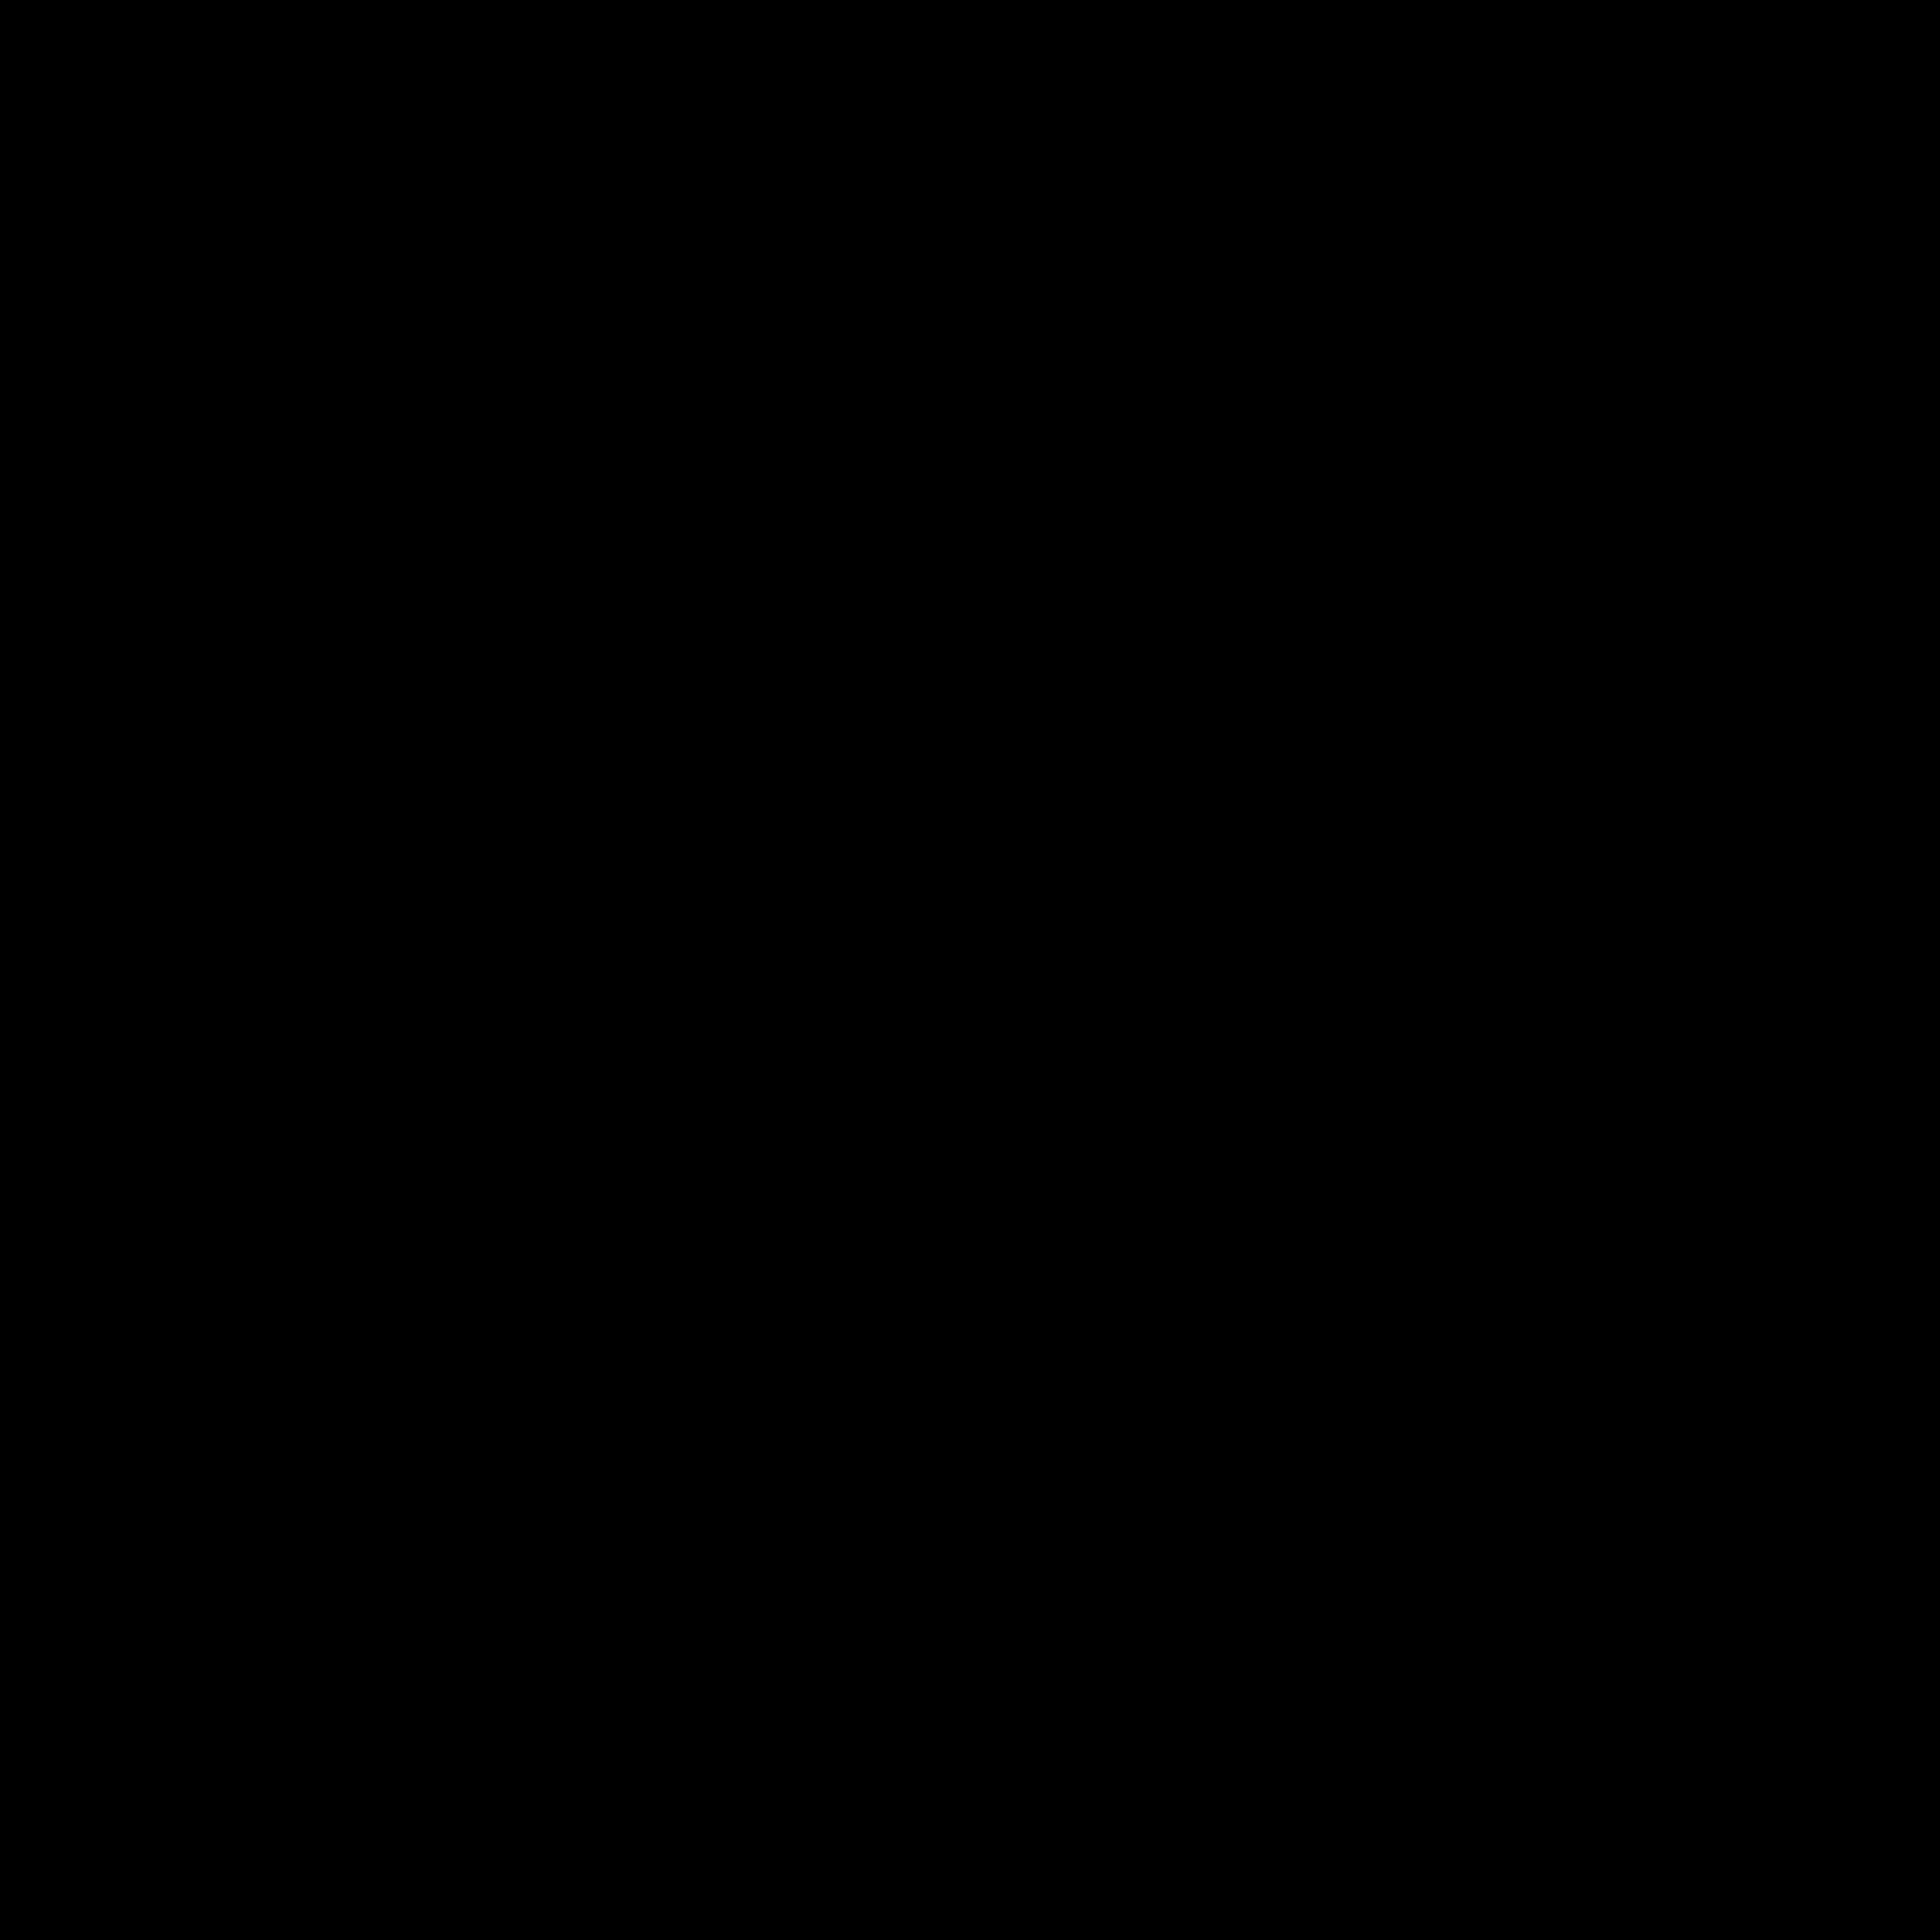 Celtic Knot PNG - 4195